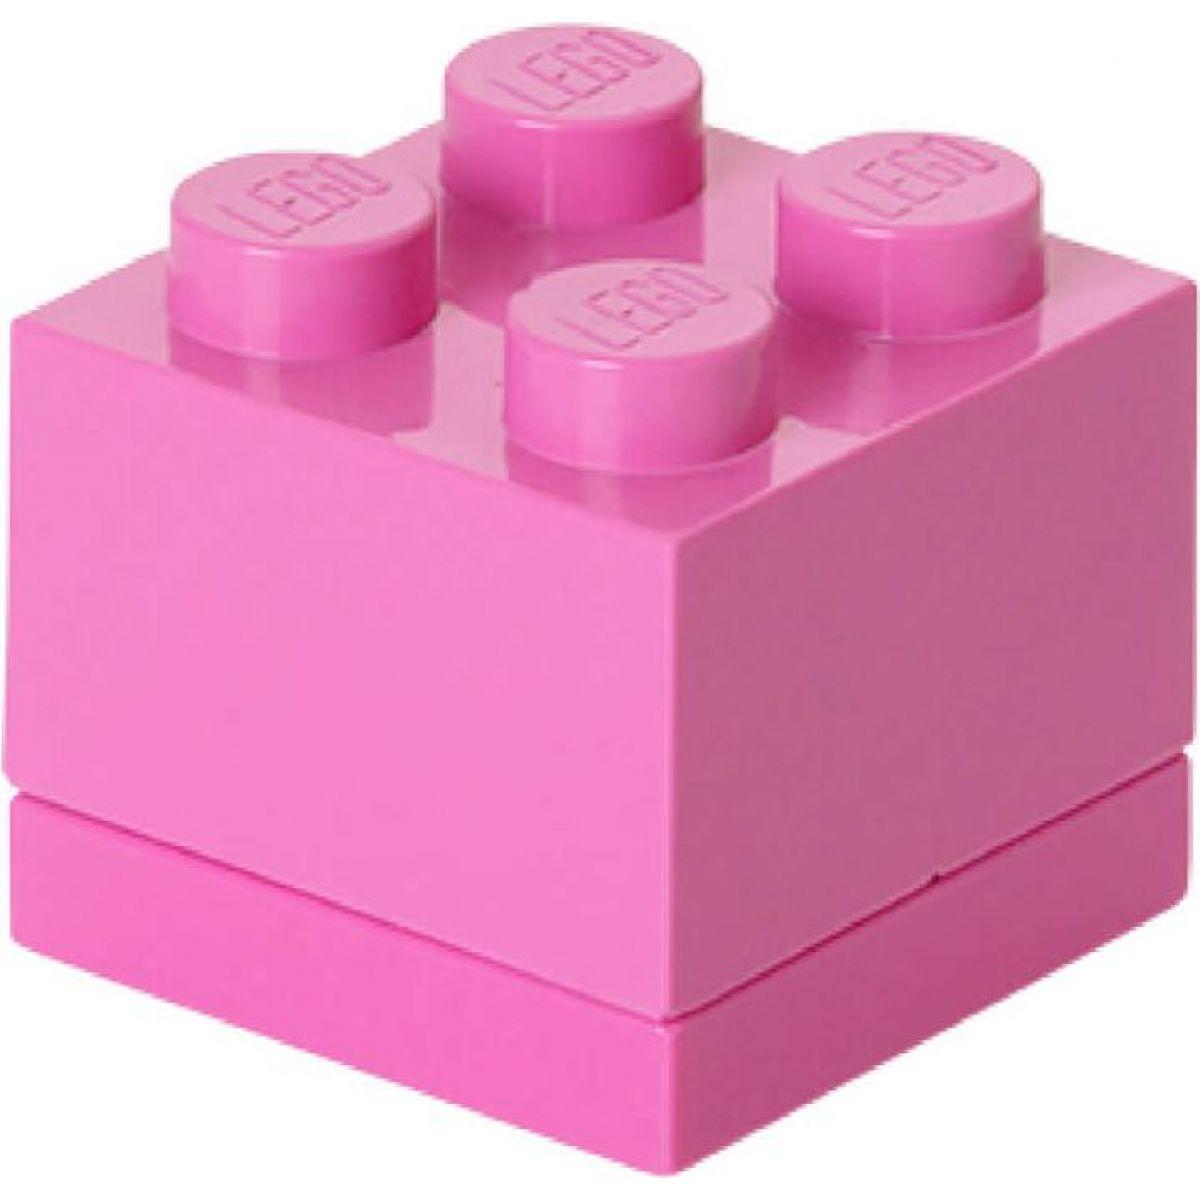 LEGO Mini Box 4,6x4,6x4,3cm Růžová